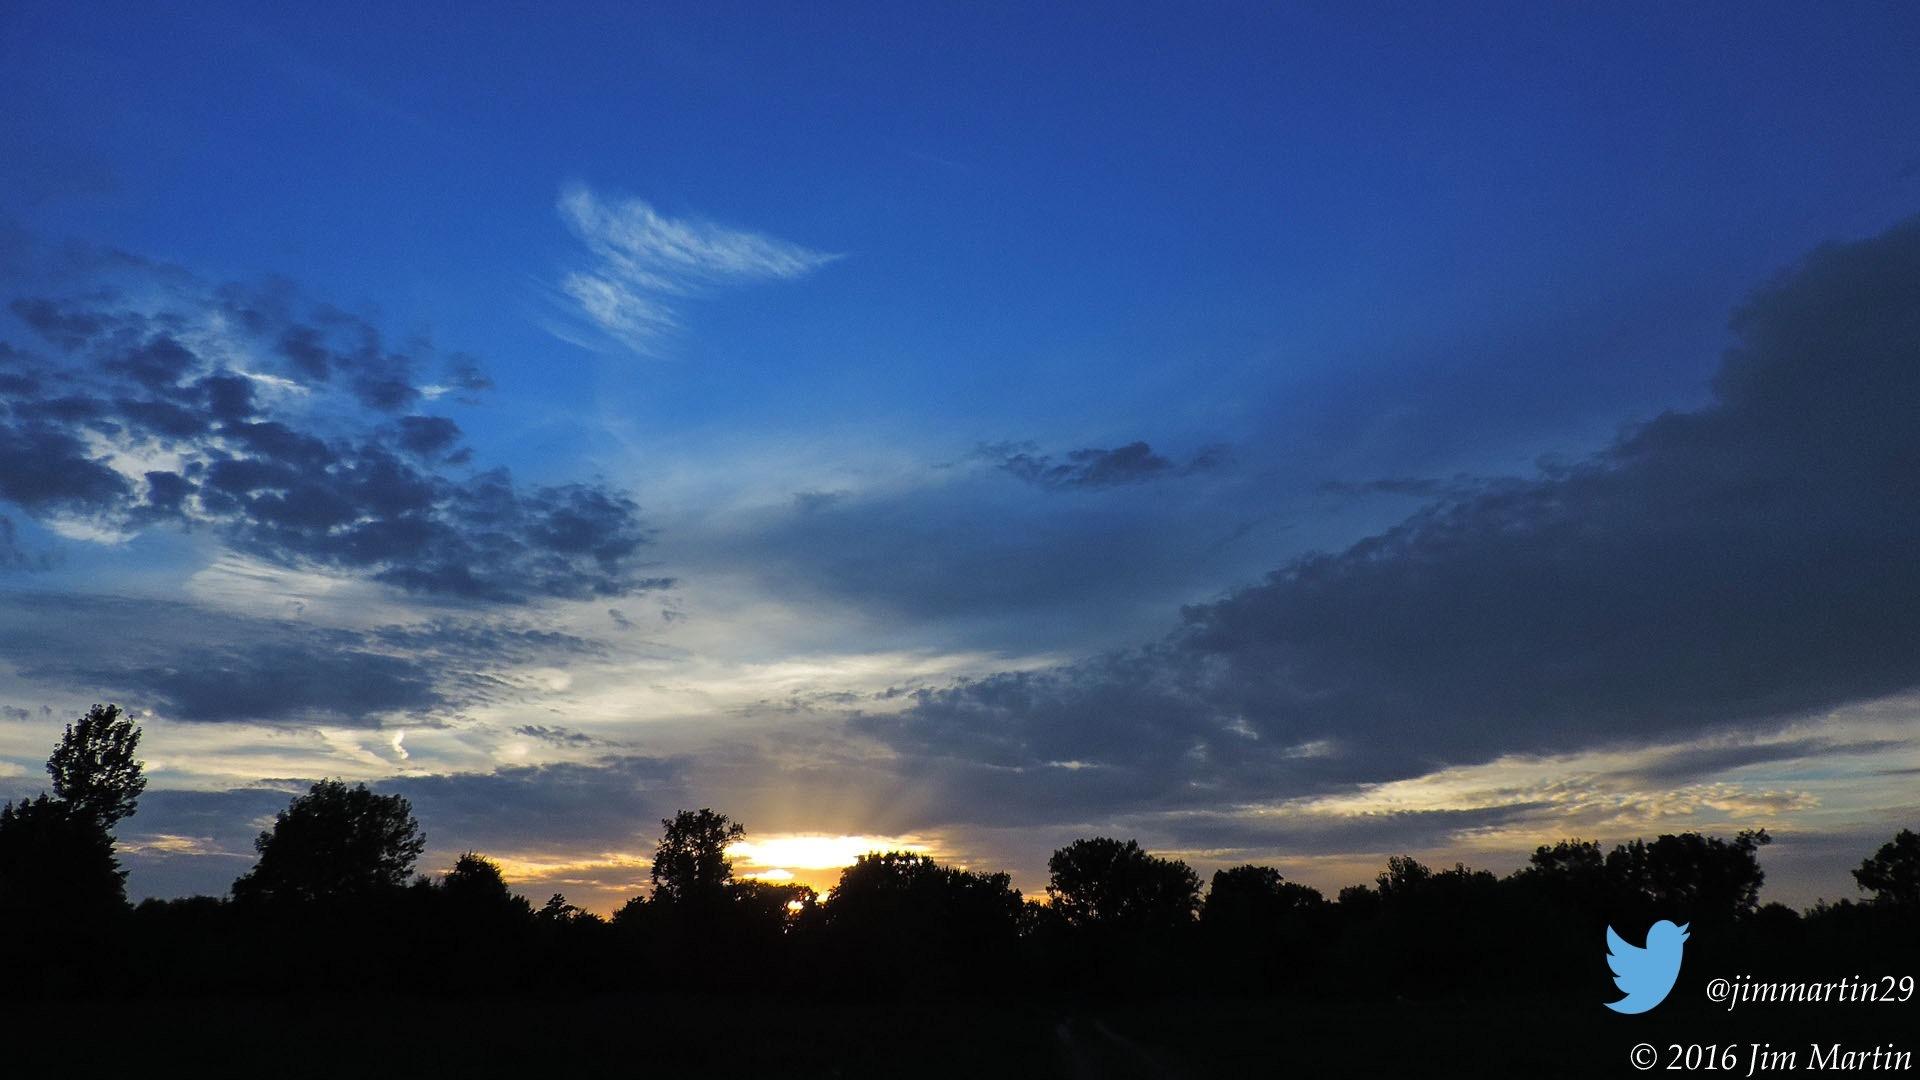 Tonight's Sunset by Jim Martin